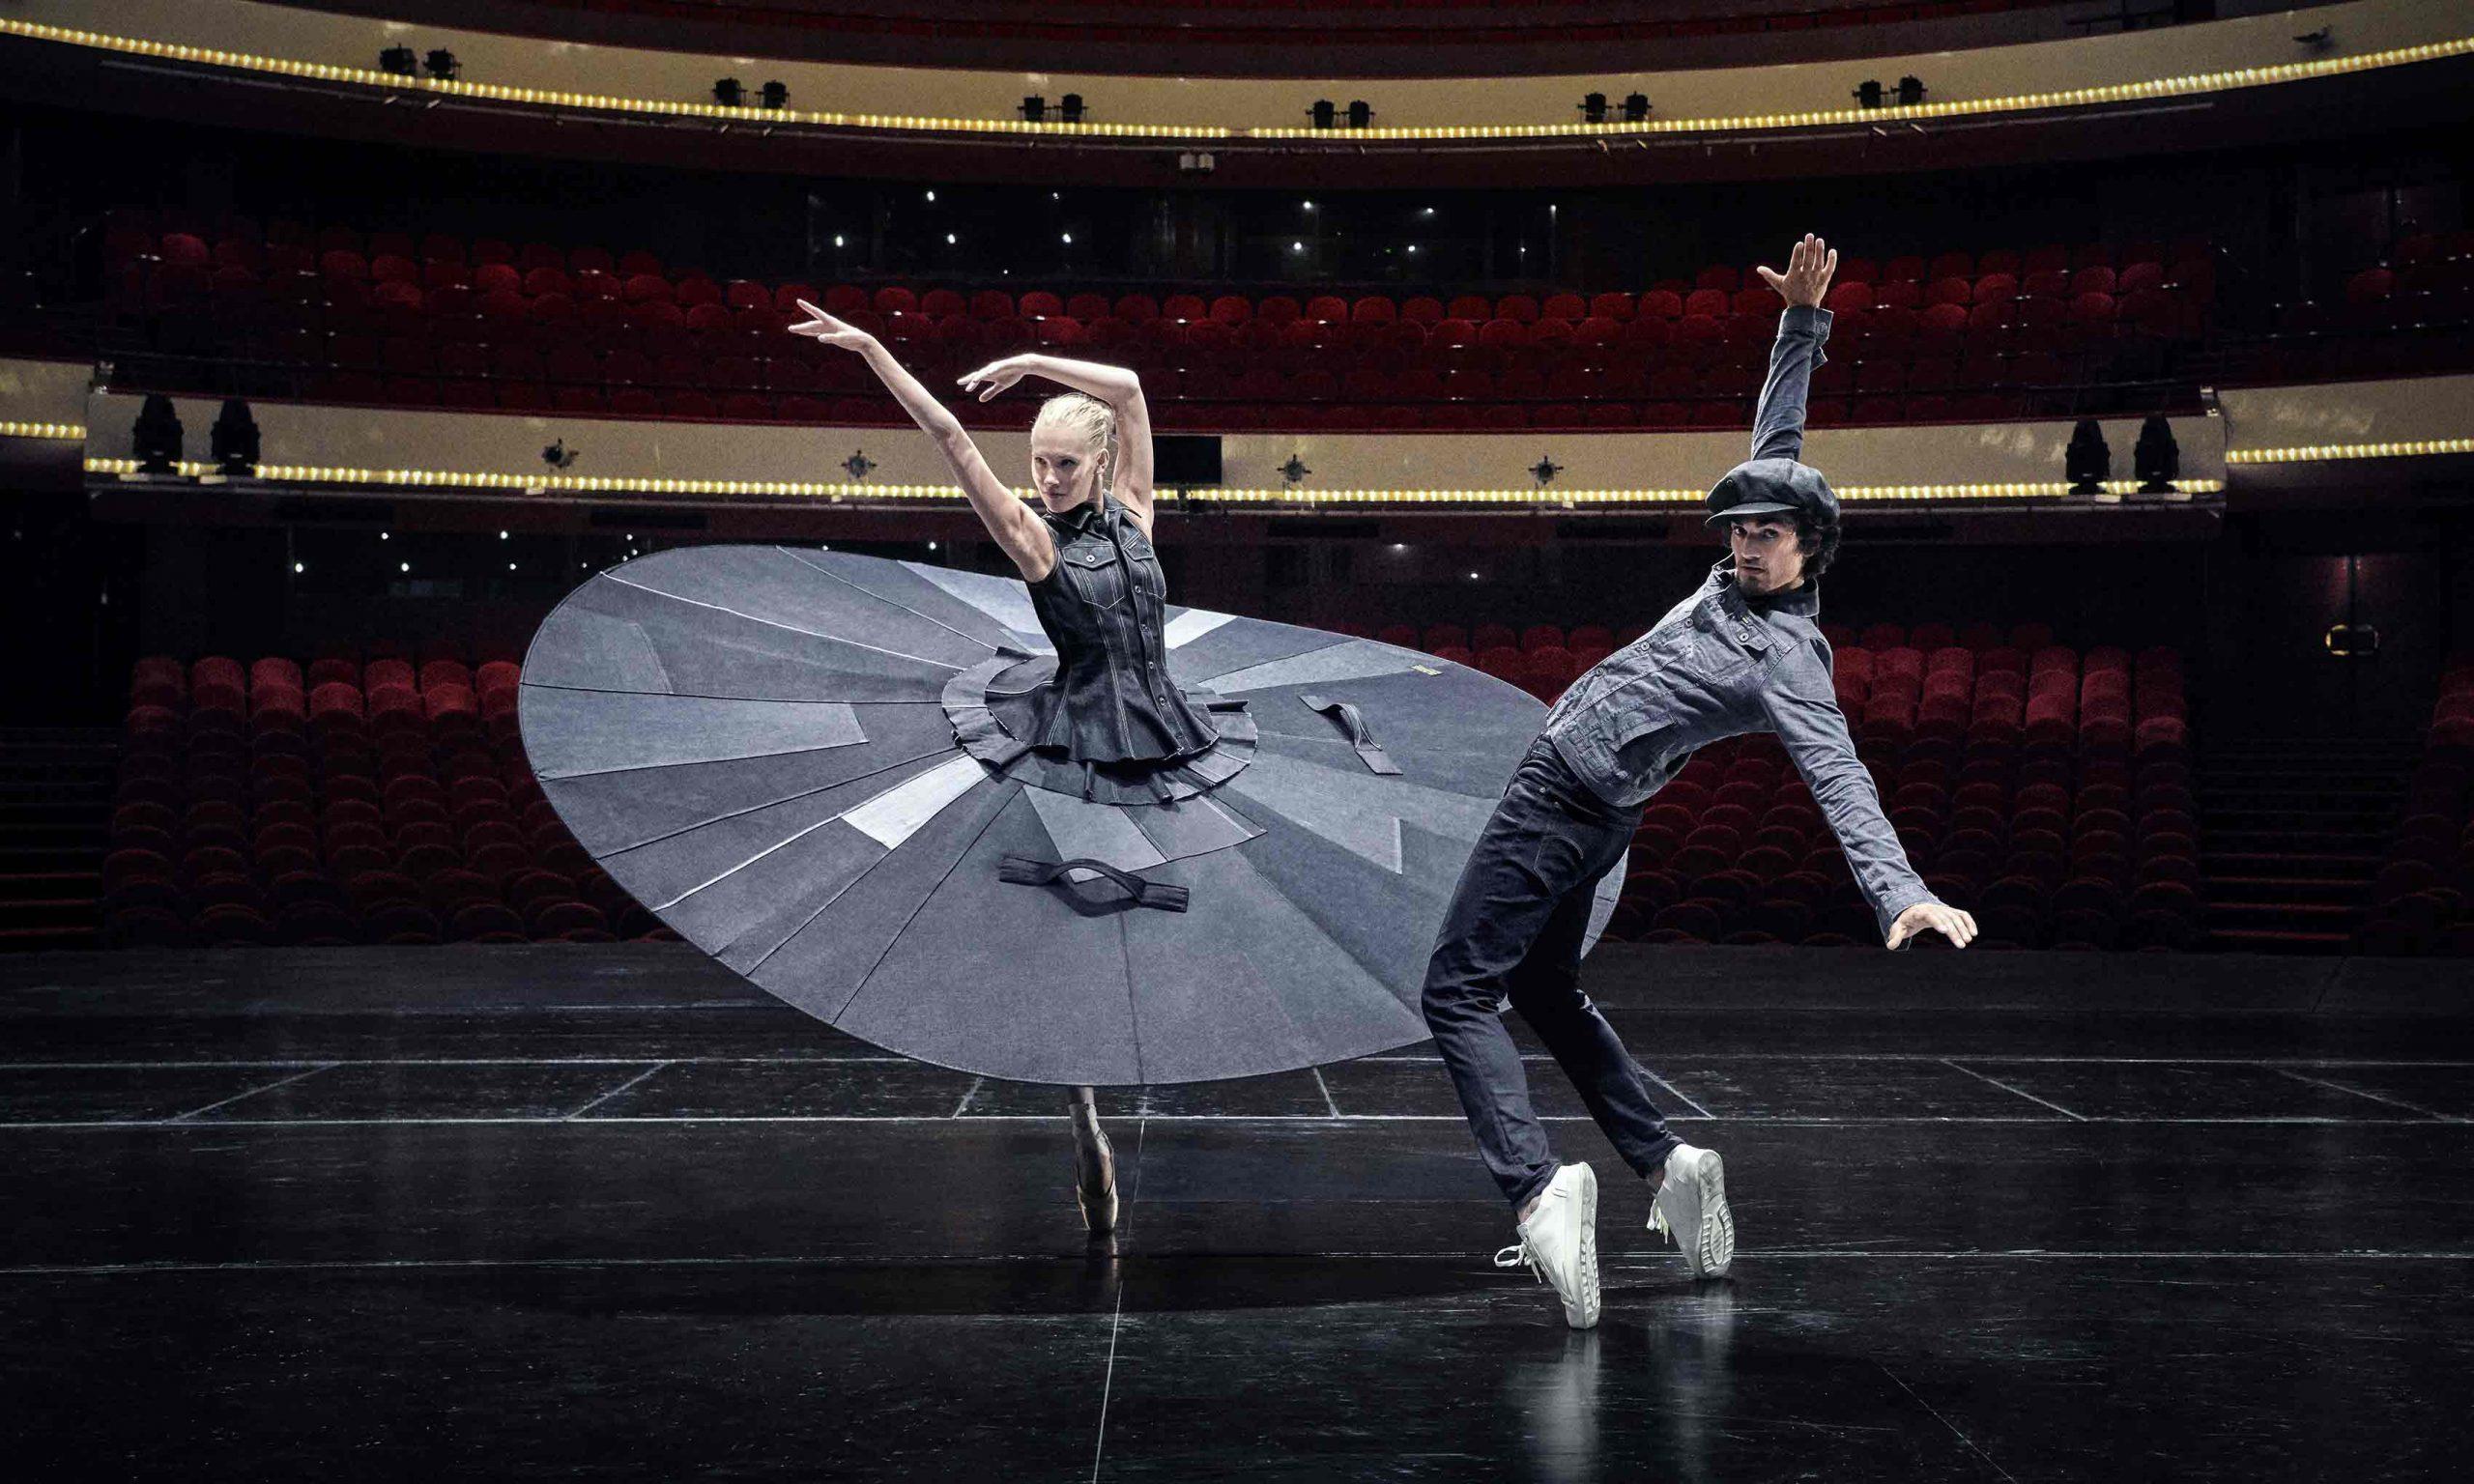 G-Star RAW 携手荷兰国家芭蕾舞团,演绎「安全社交距离芭蕾舞」